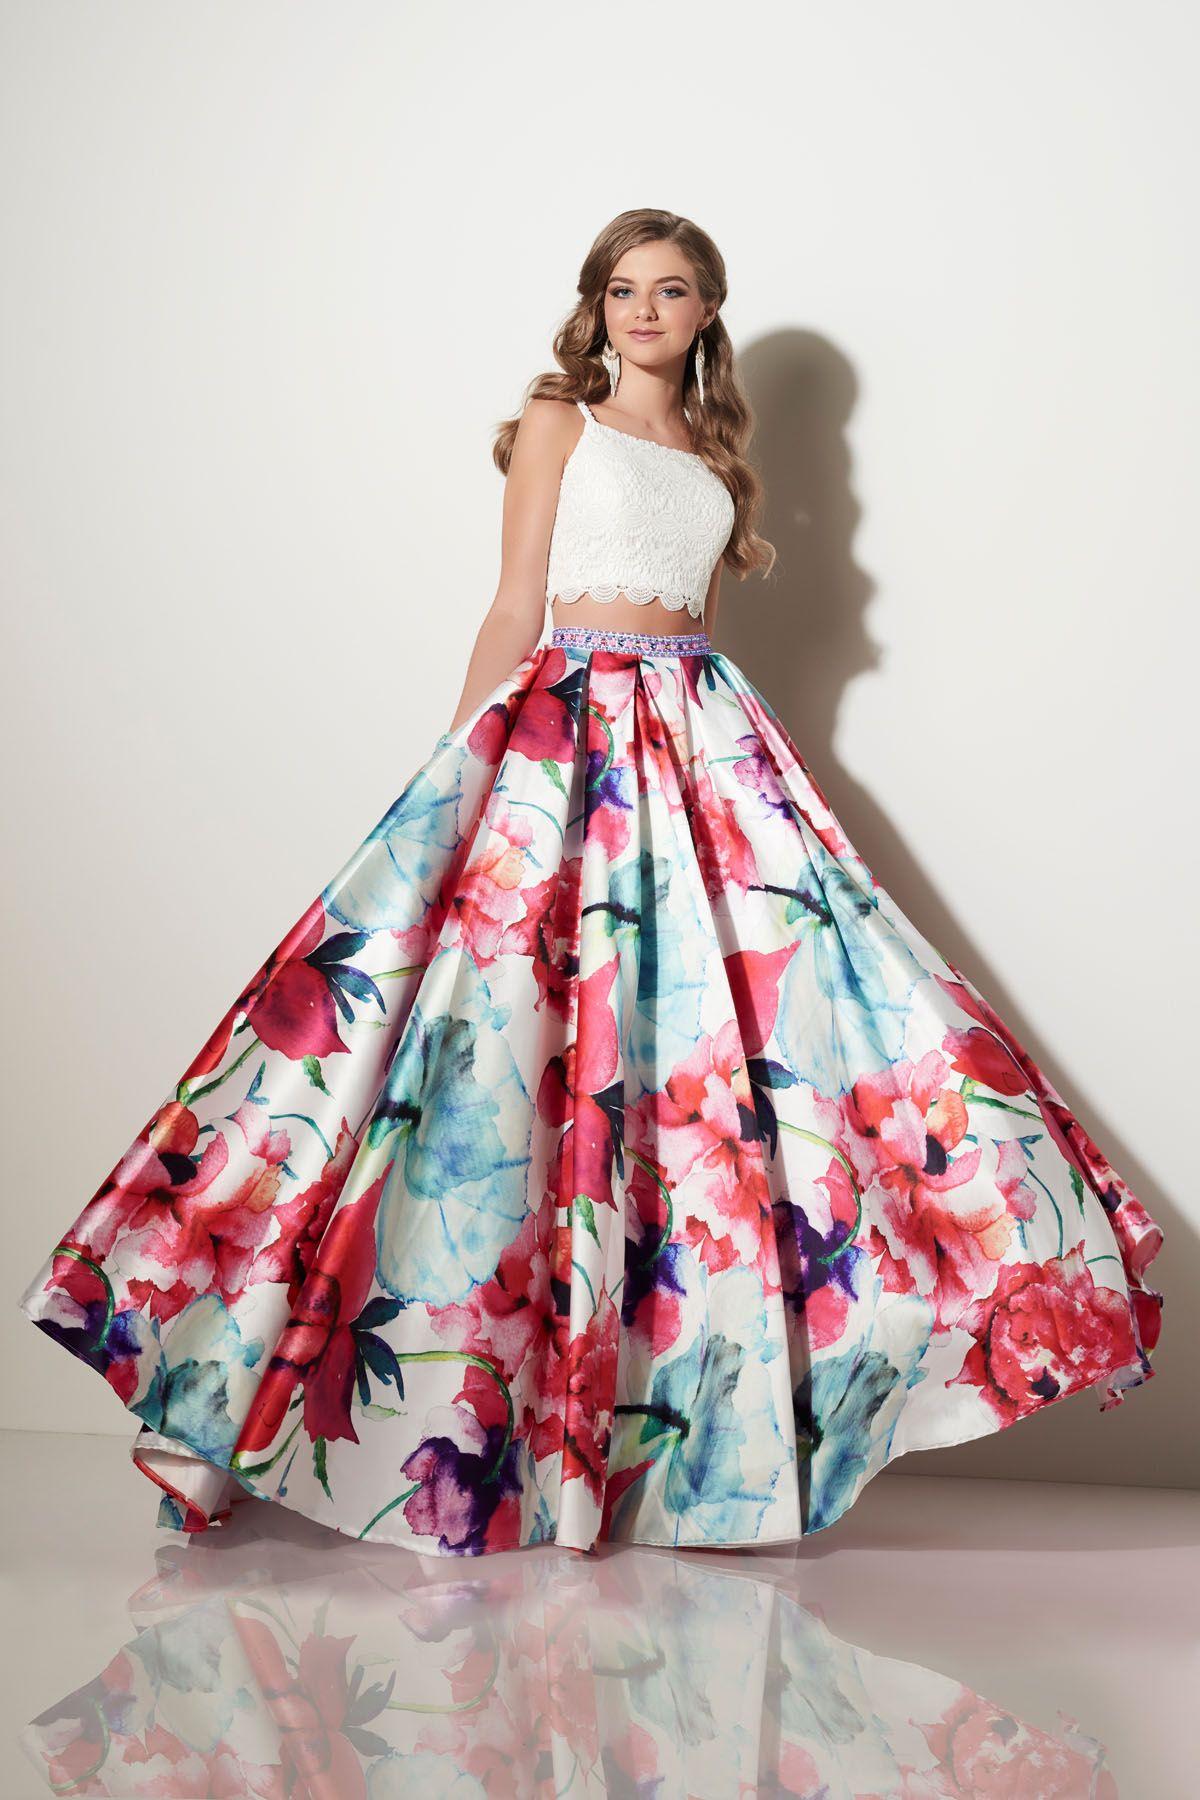 Make A Huge Splash With Studio 17 Prom Ipa Best Prom Dresses Prom Dresses Two Piece Piece Prom Dress [ 1800 x 1200 Pixel ]